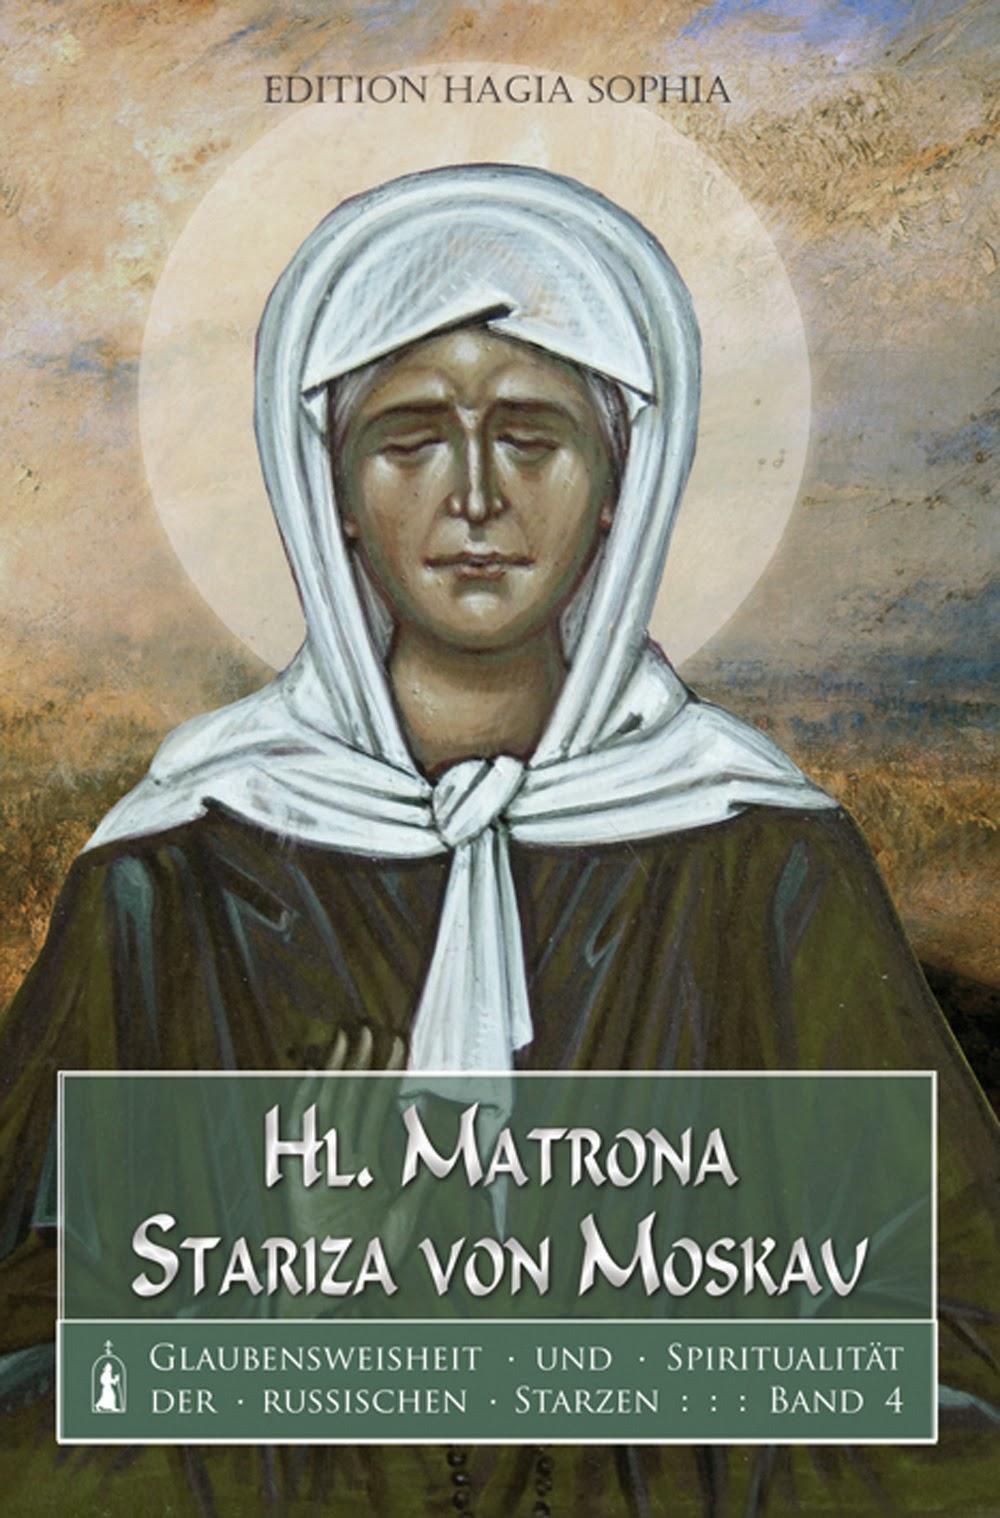 Hl. Matrona - Stariza von Moskau